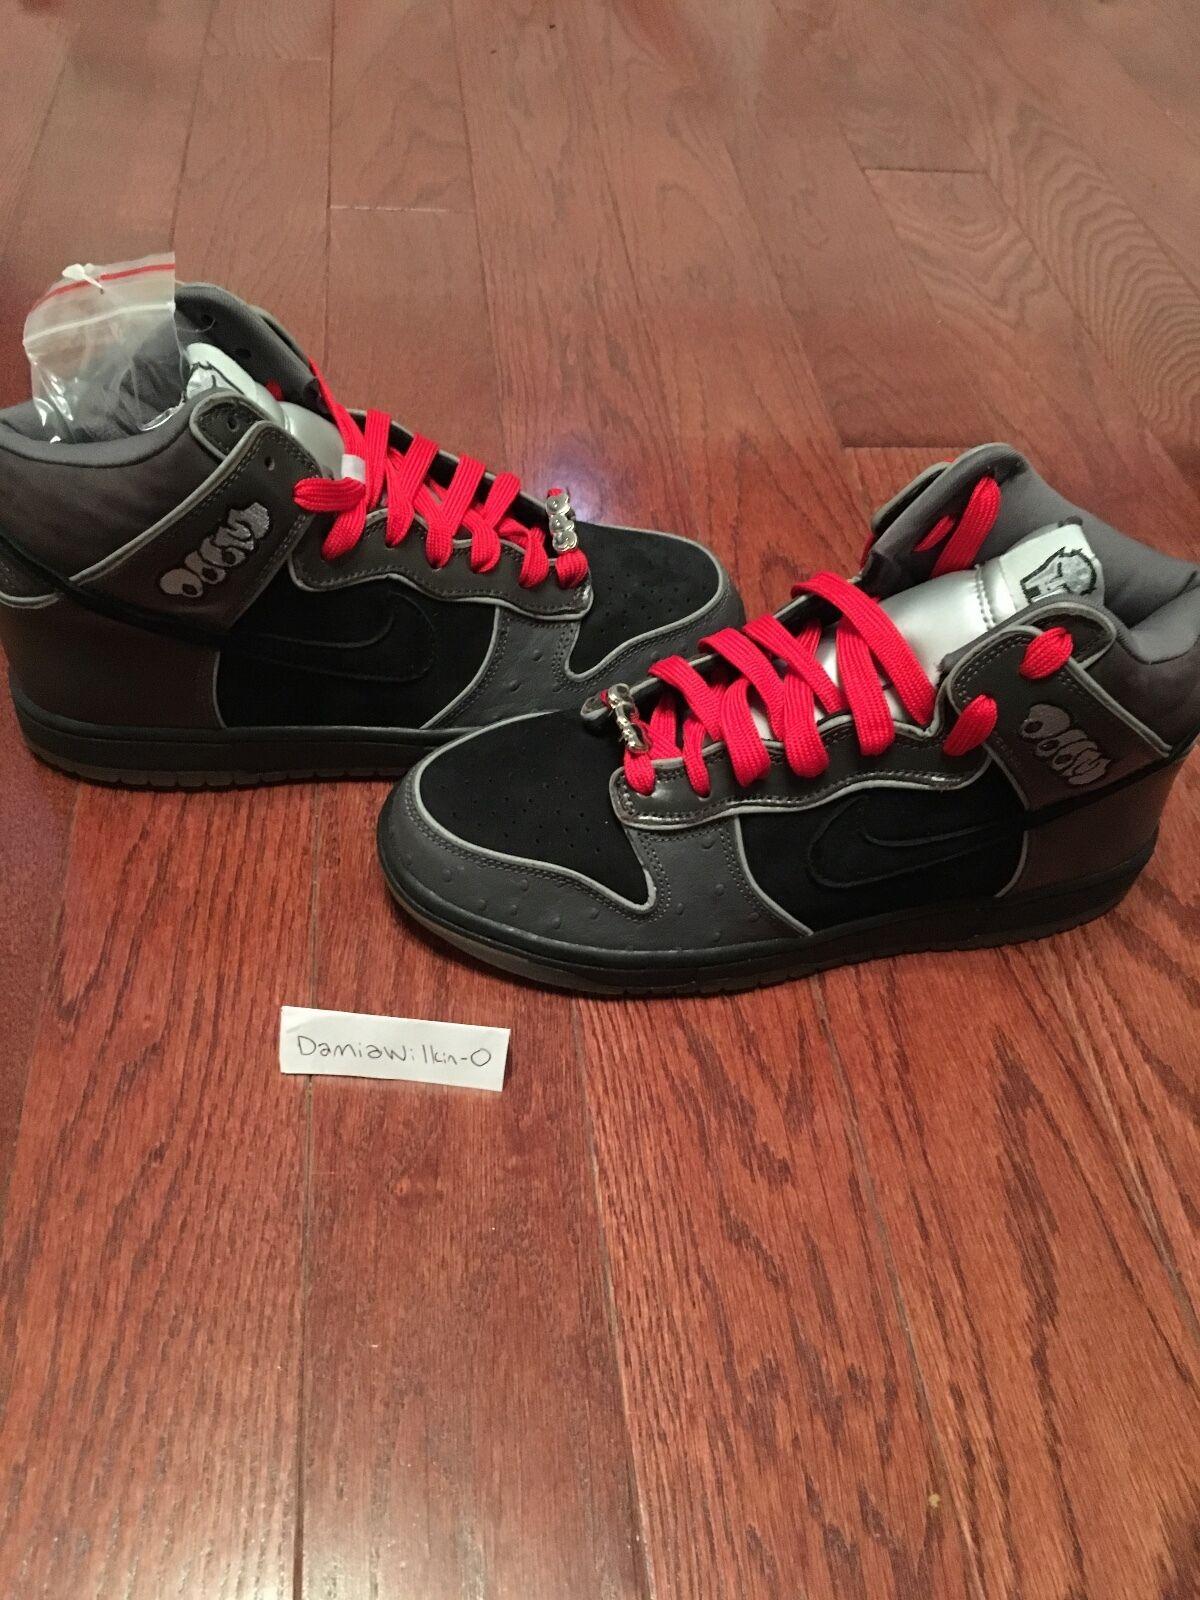 Nike sb mf doom size 7 dead stock new in box 100% authentic